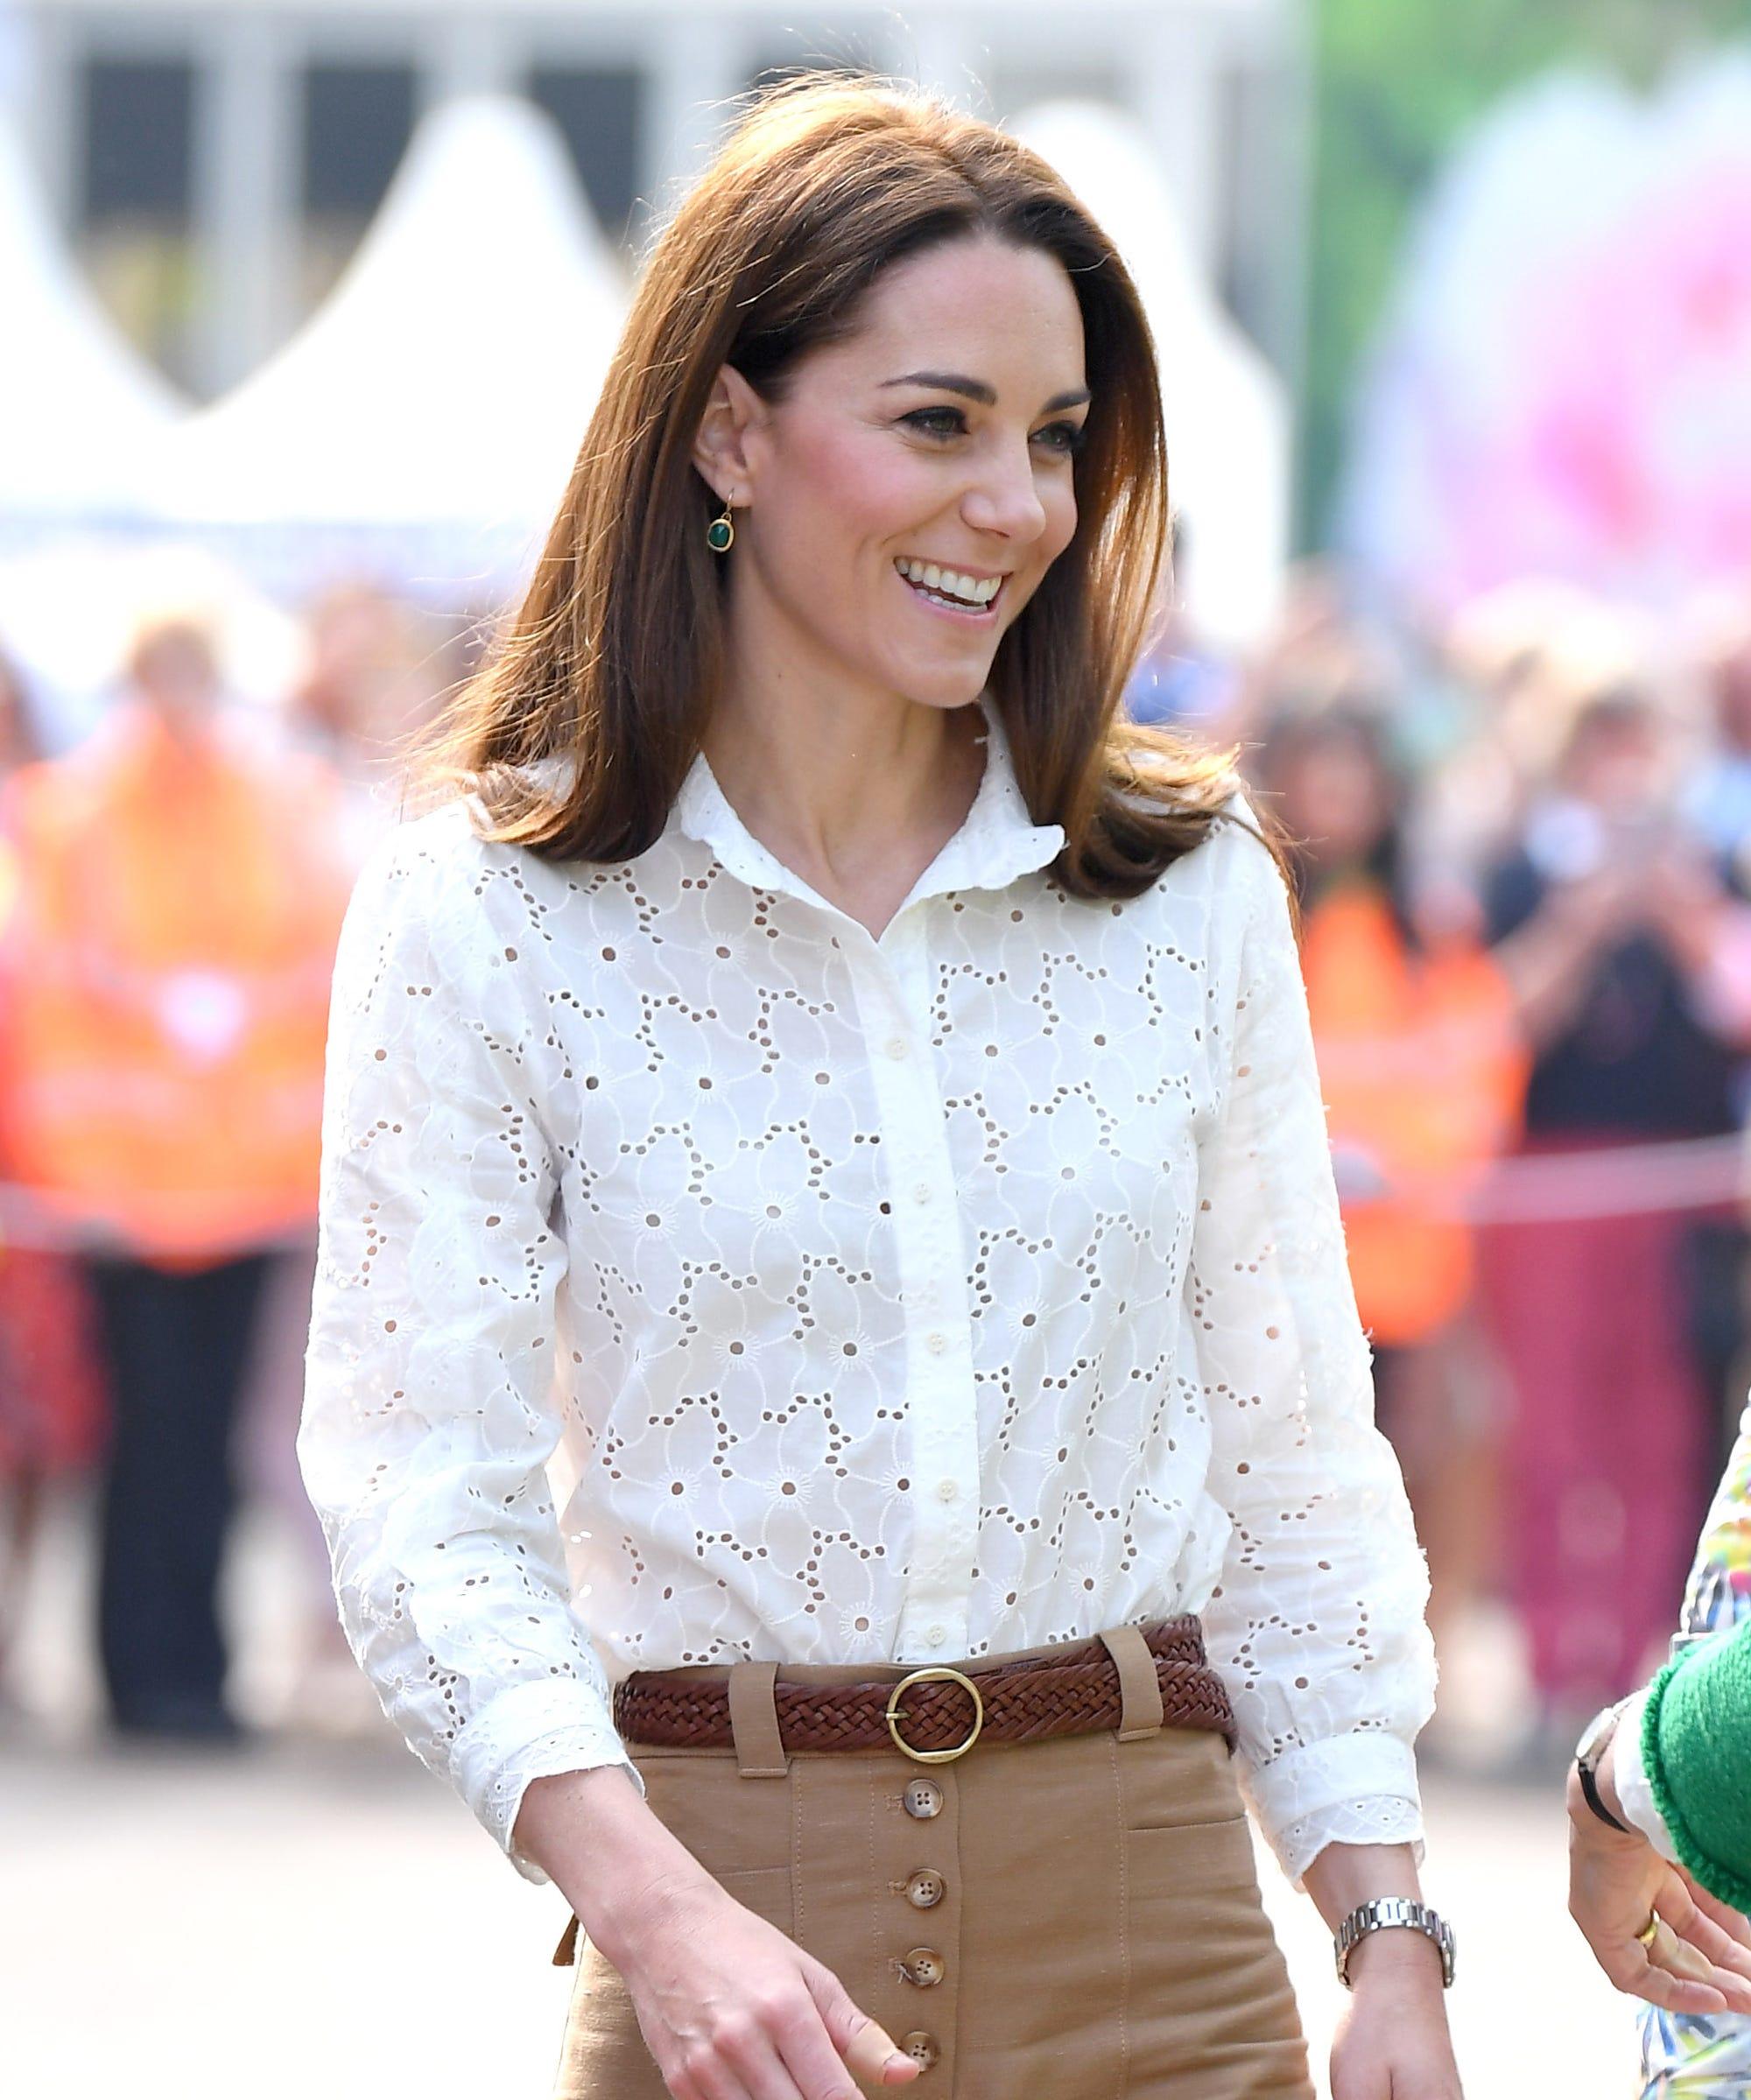 Kate Middleton's Superga Sneakers Are On Sale At Amazon